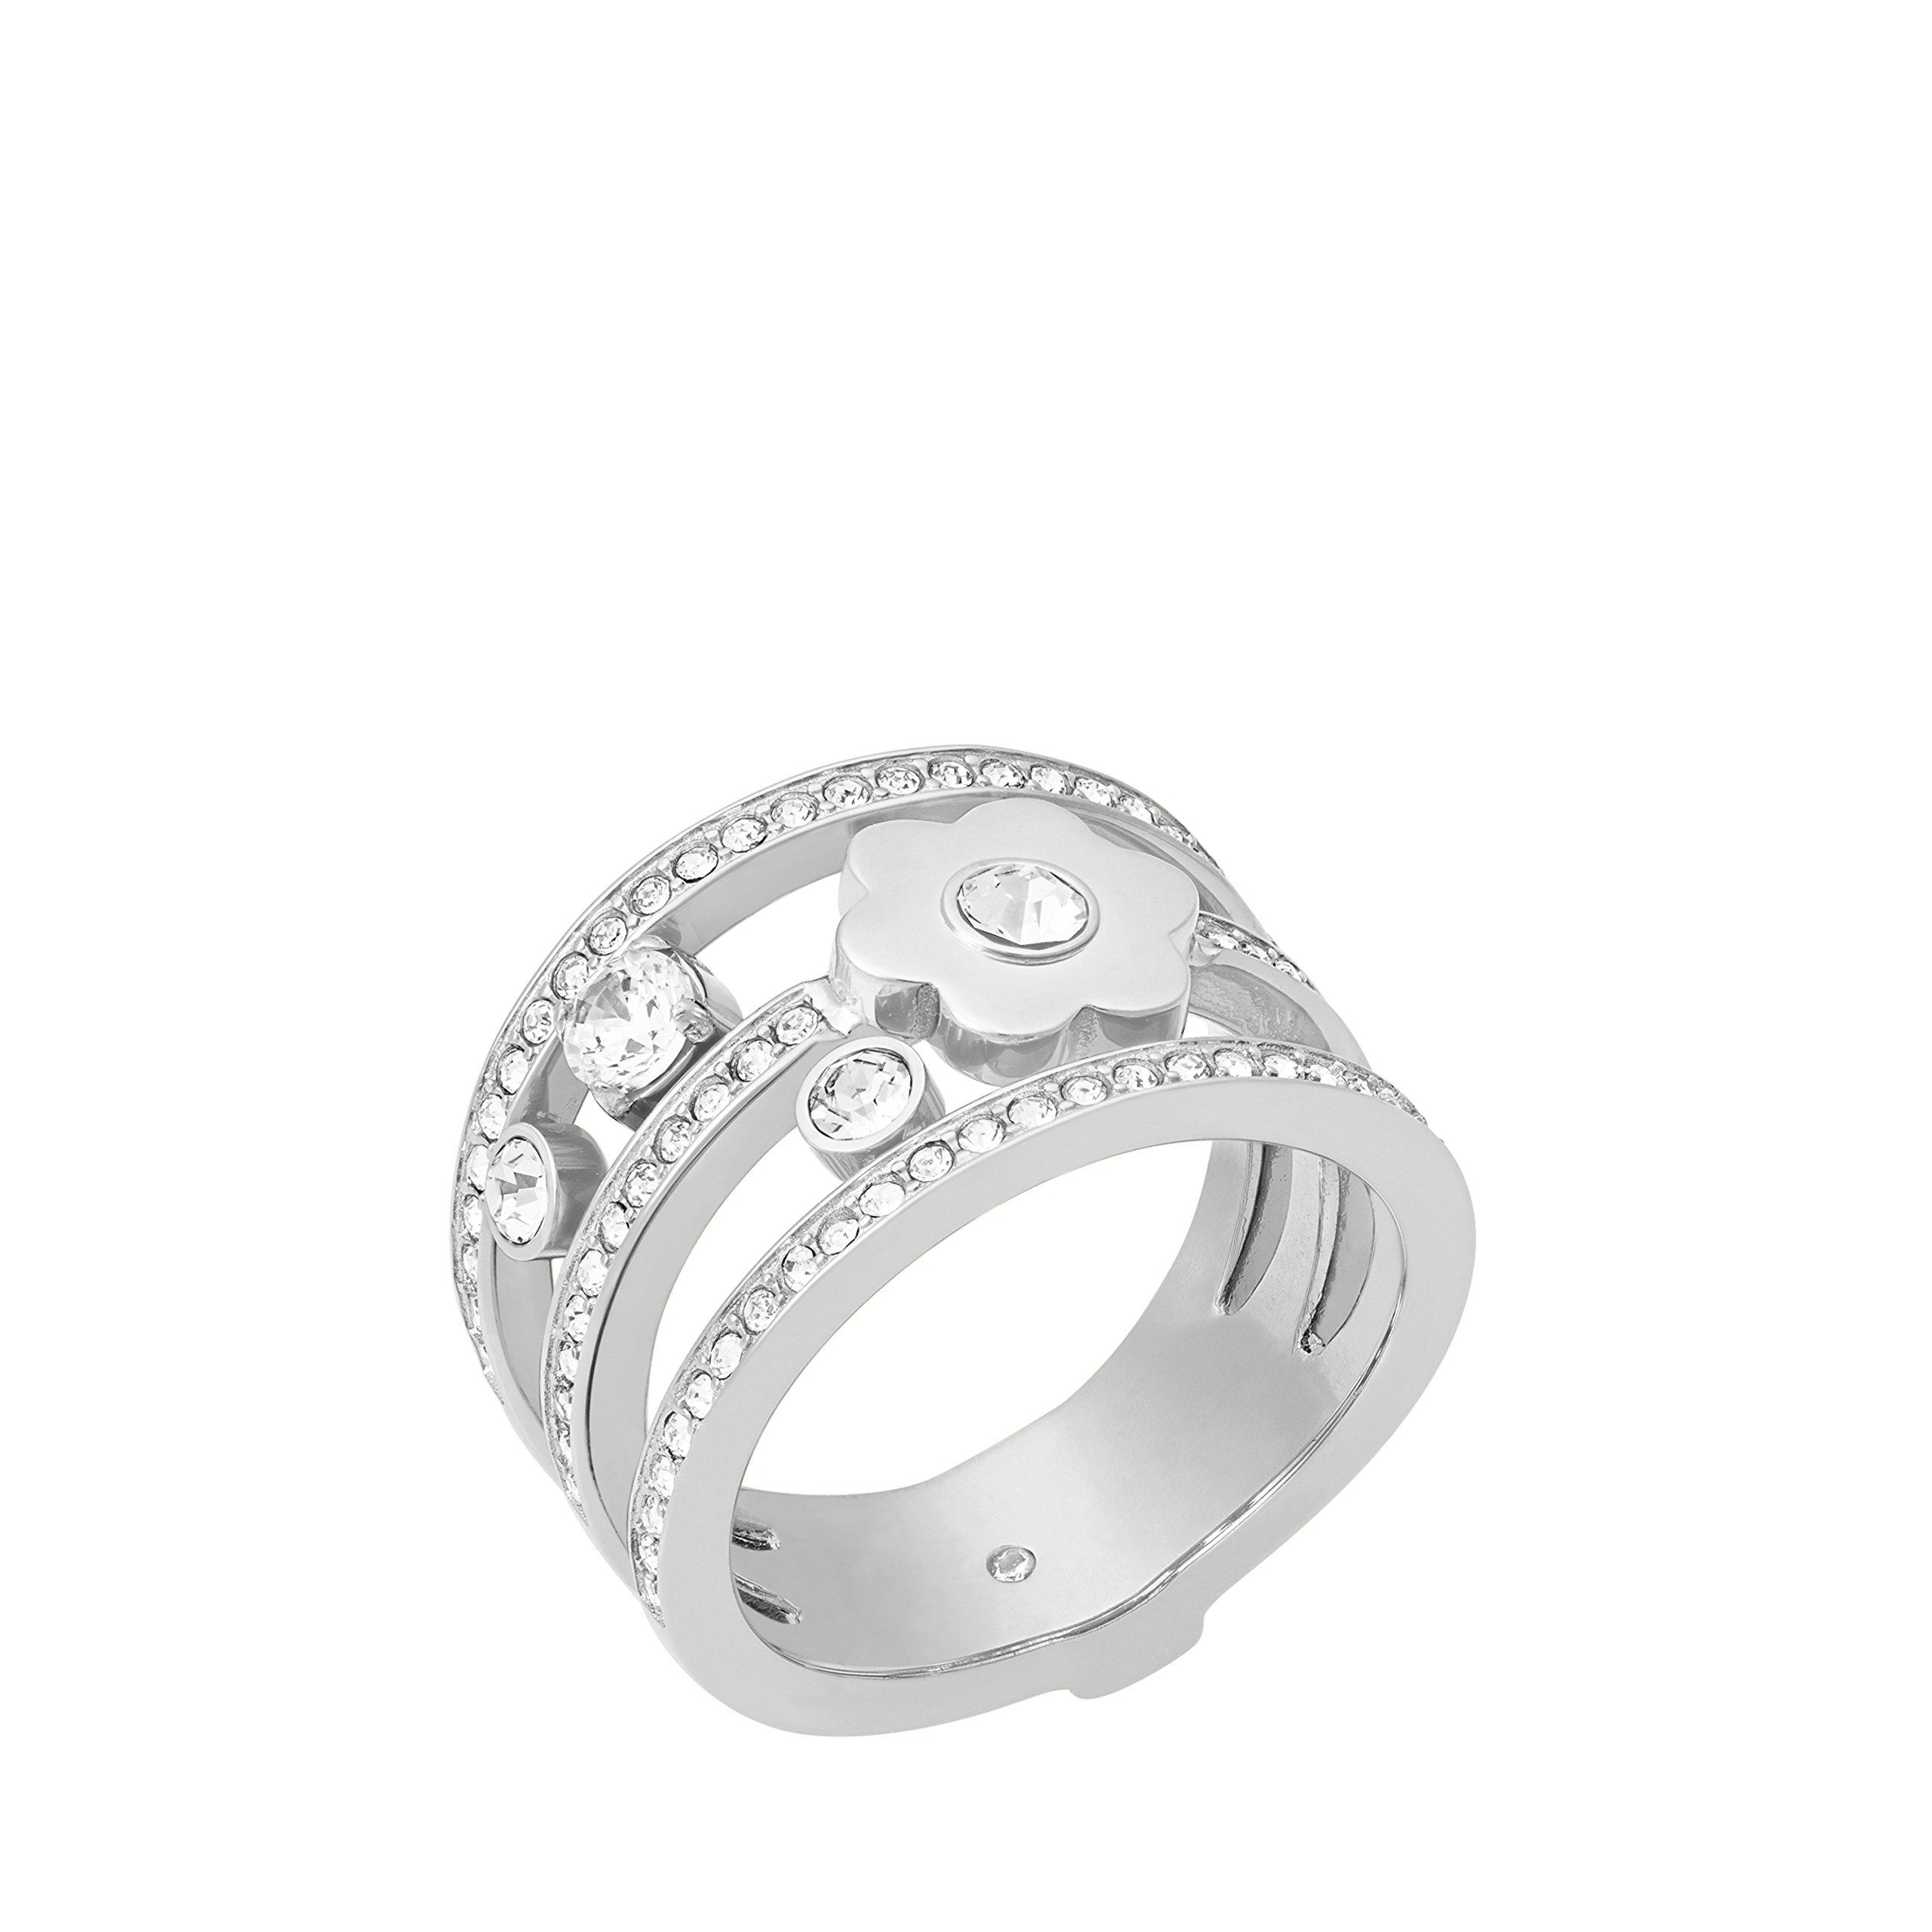 Michael Kors Womens Silver-Tone Flower Ring, 6